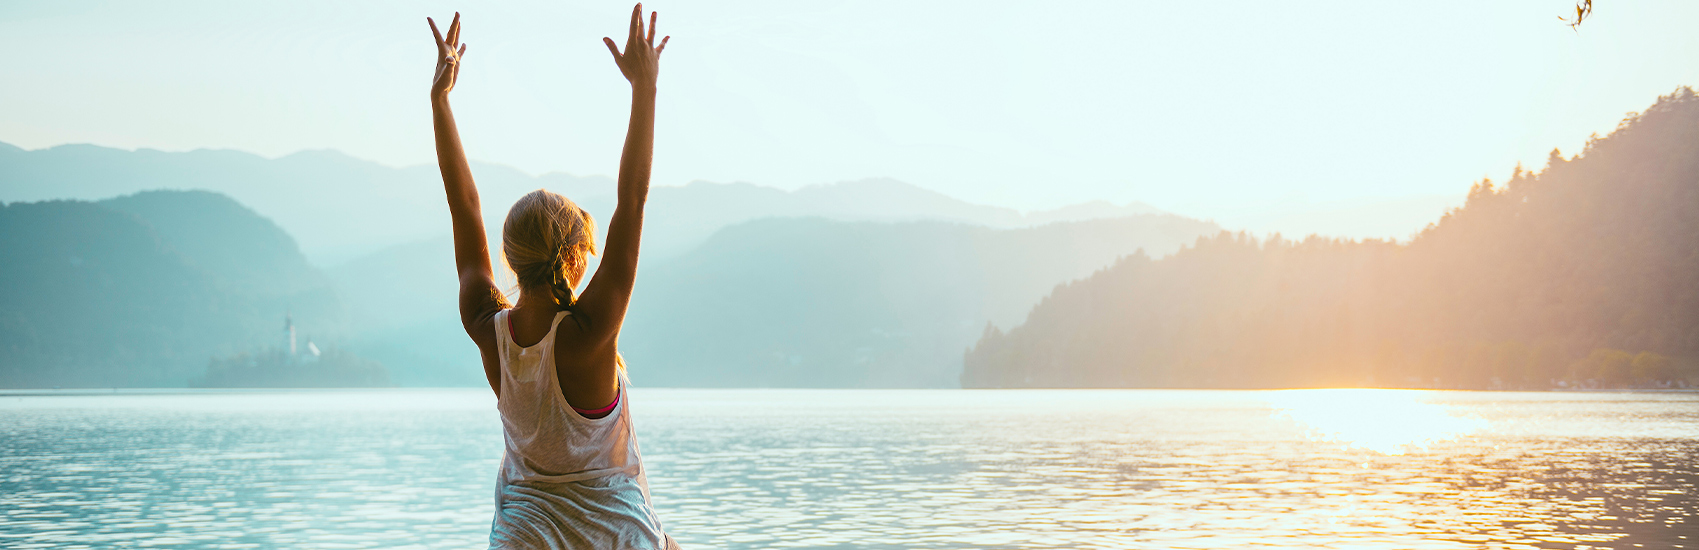 Retraite Bienveillance et Yoga 0